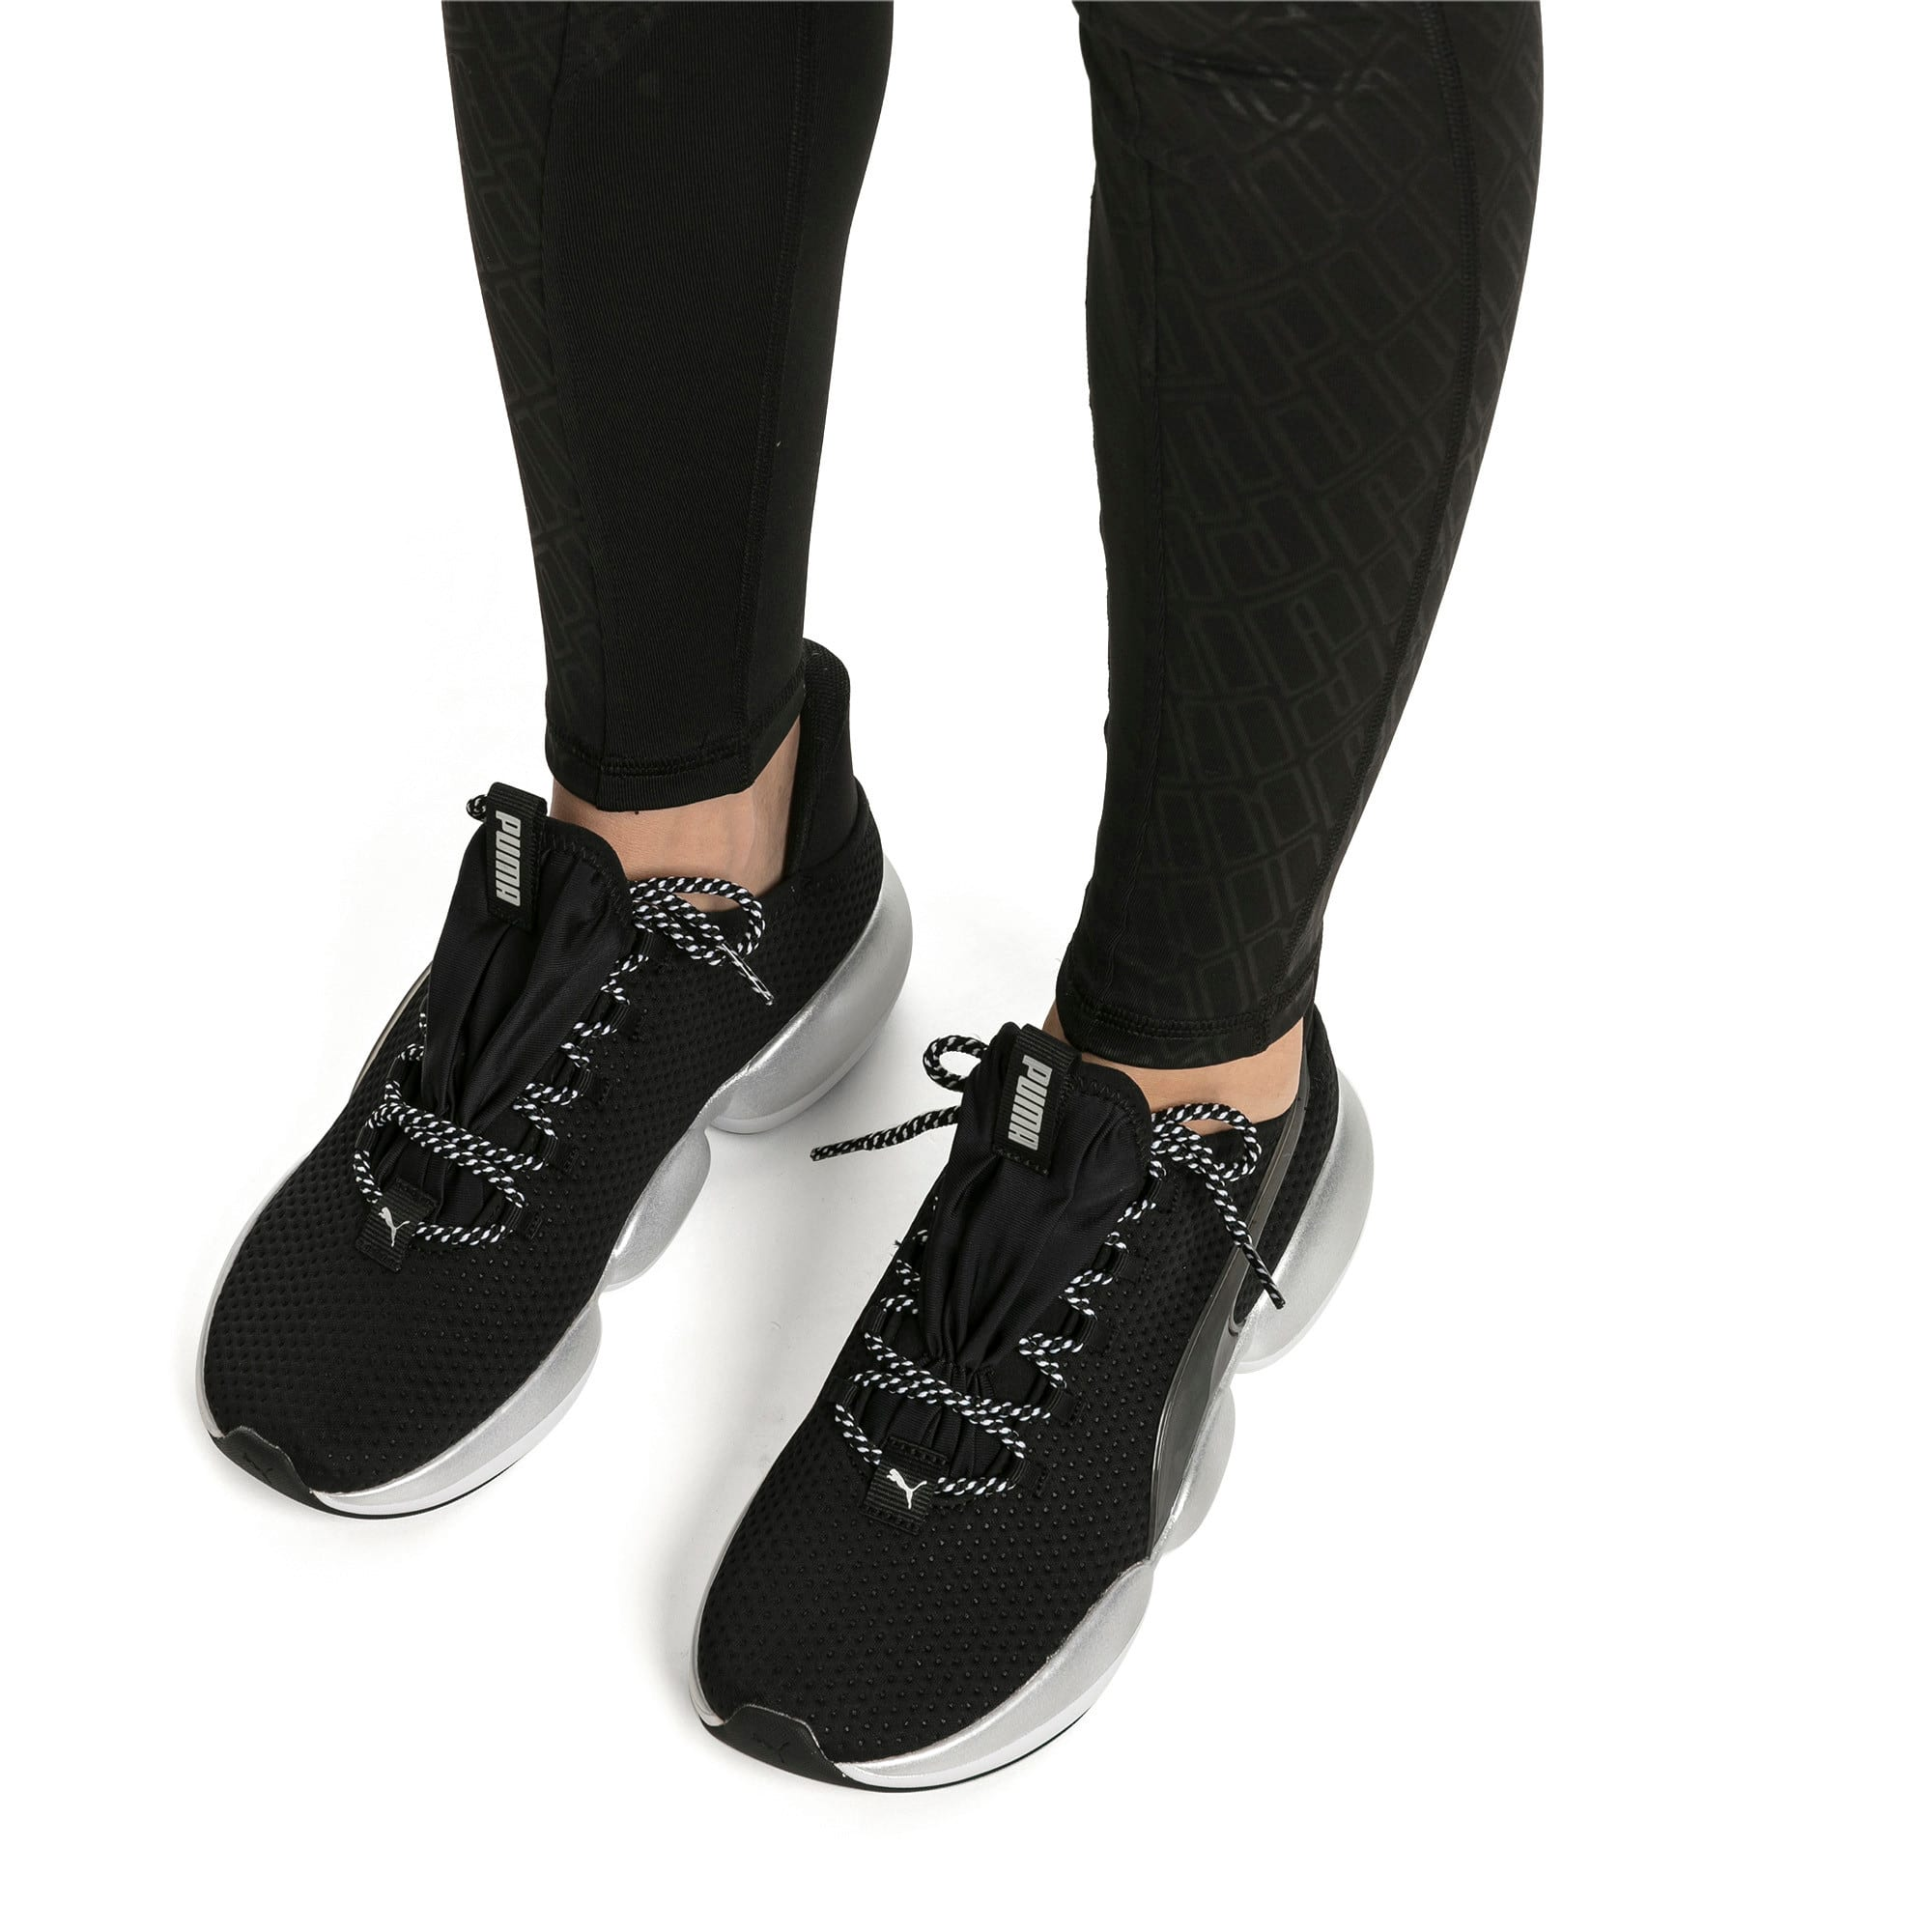 Thumbnail 2 of Mode XT Women's Training Shoes, Puma Black-Puma White, medium